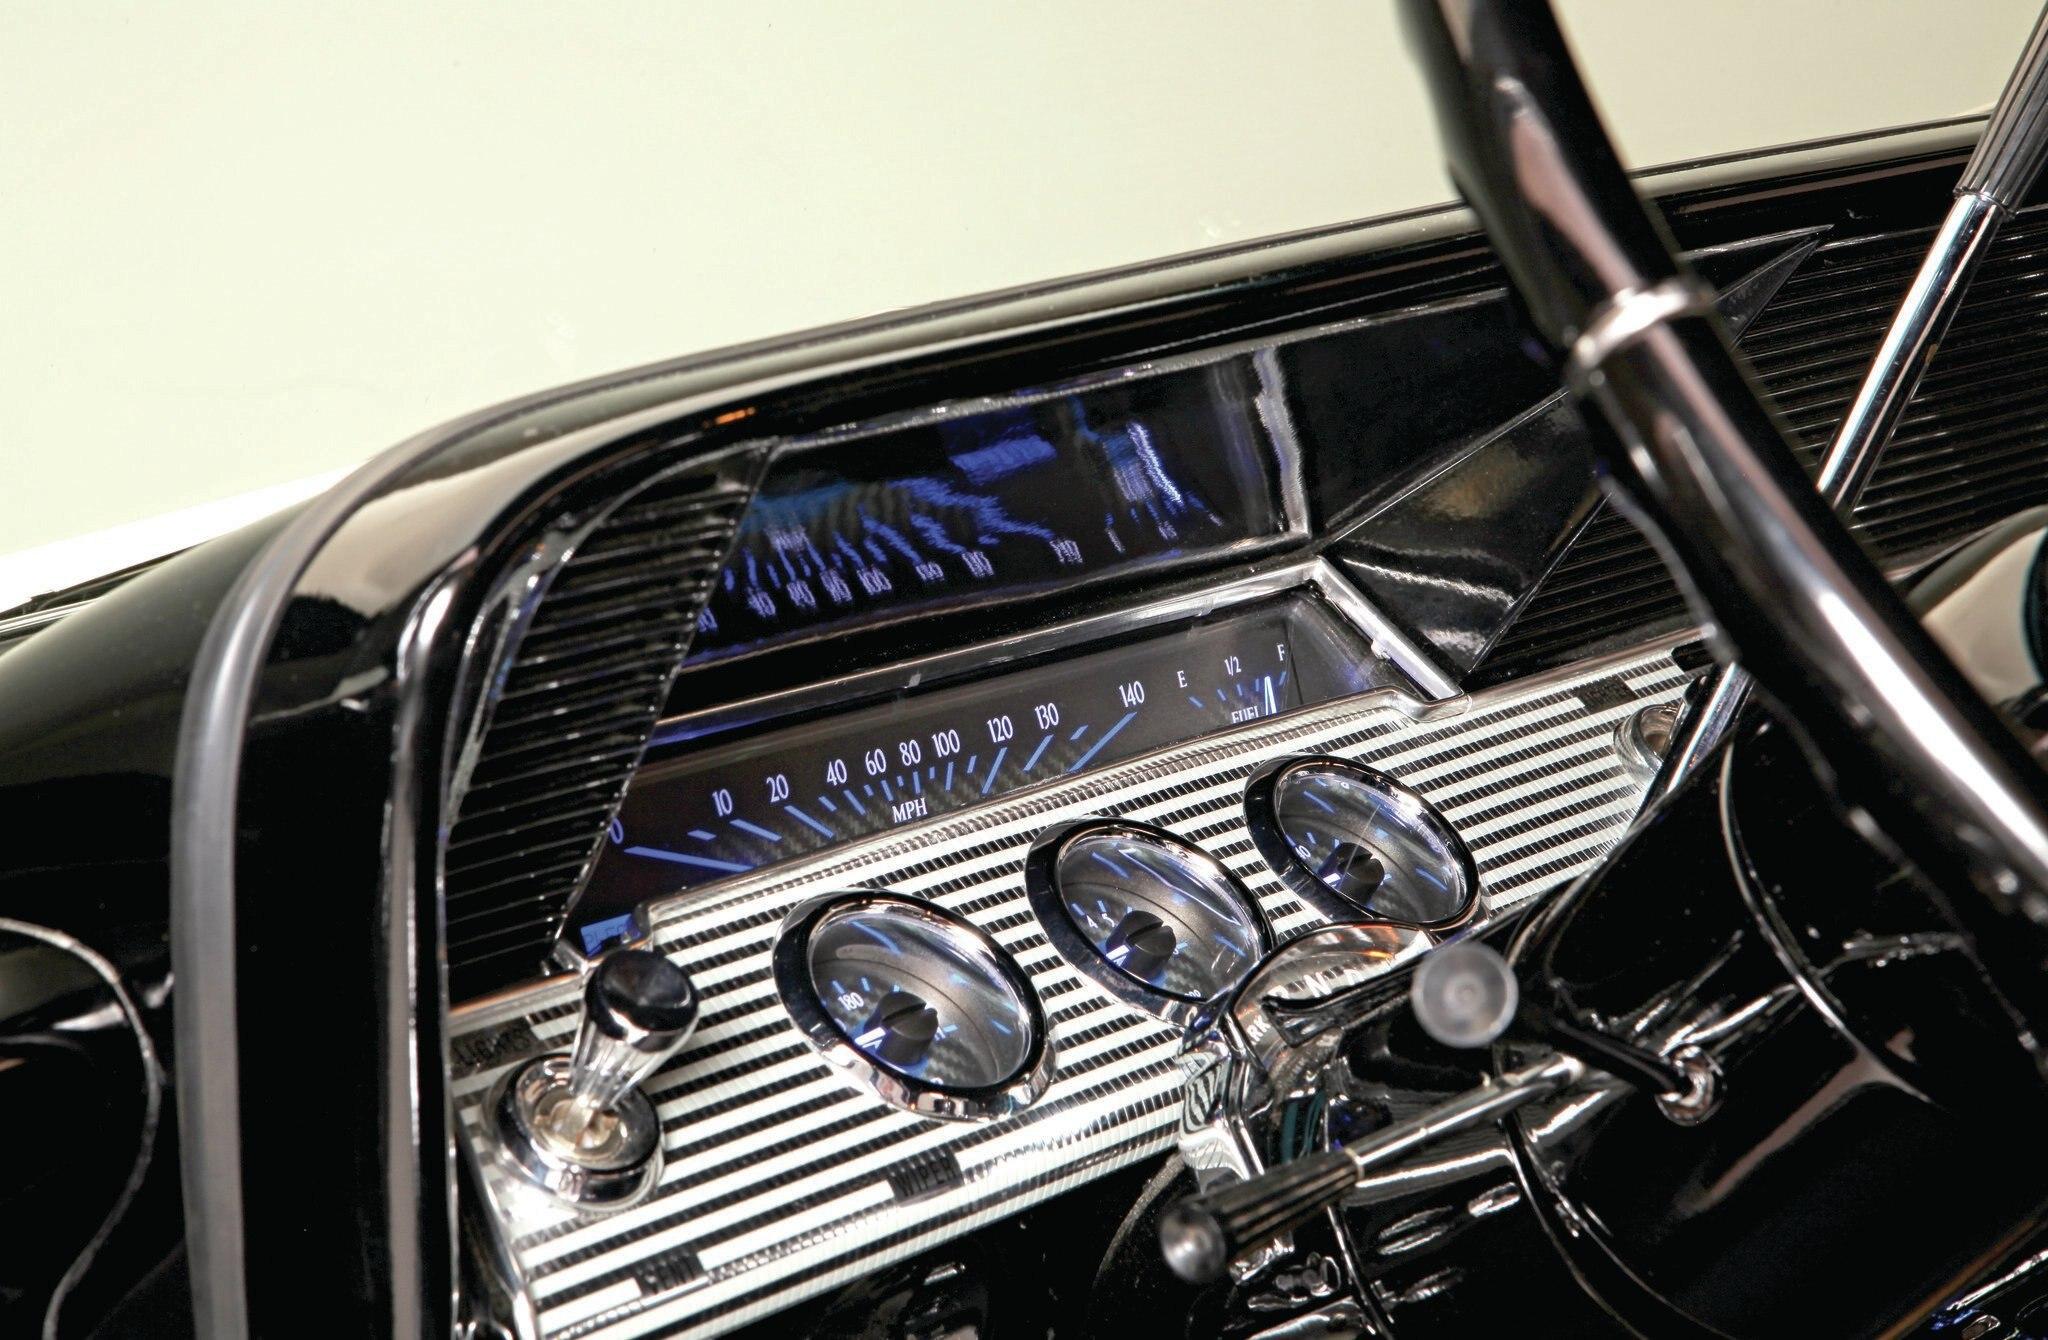 1962 Chevrolet Impala - Black Diamond